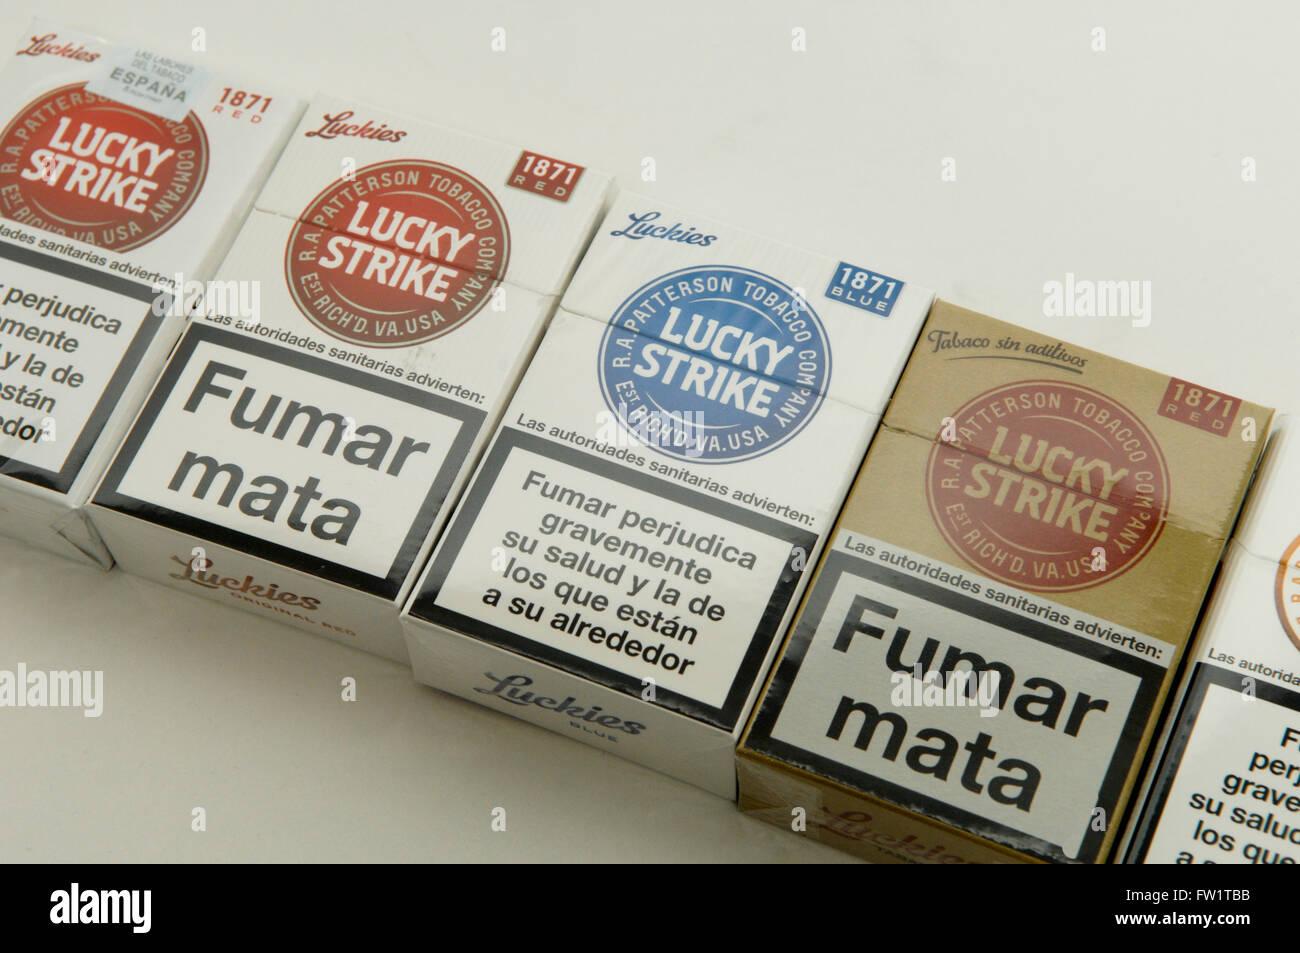 Cost of cigarettes Monte Carlo in England